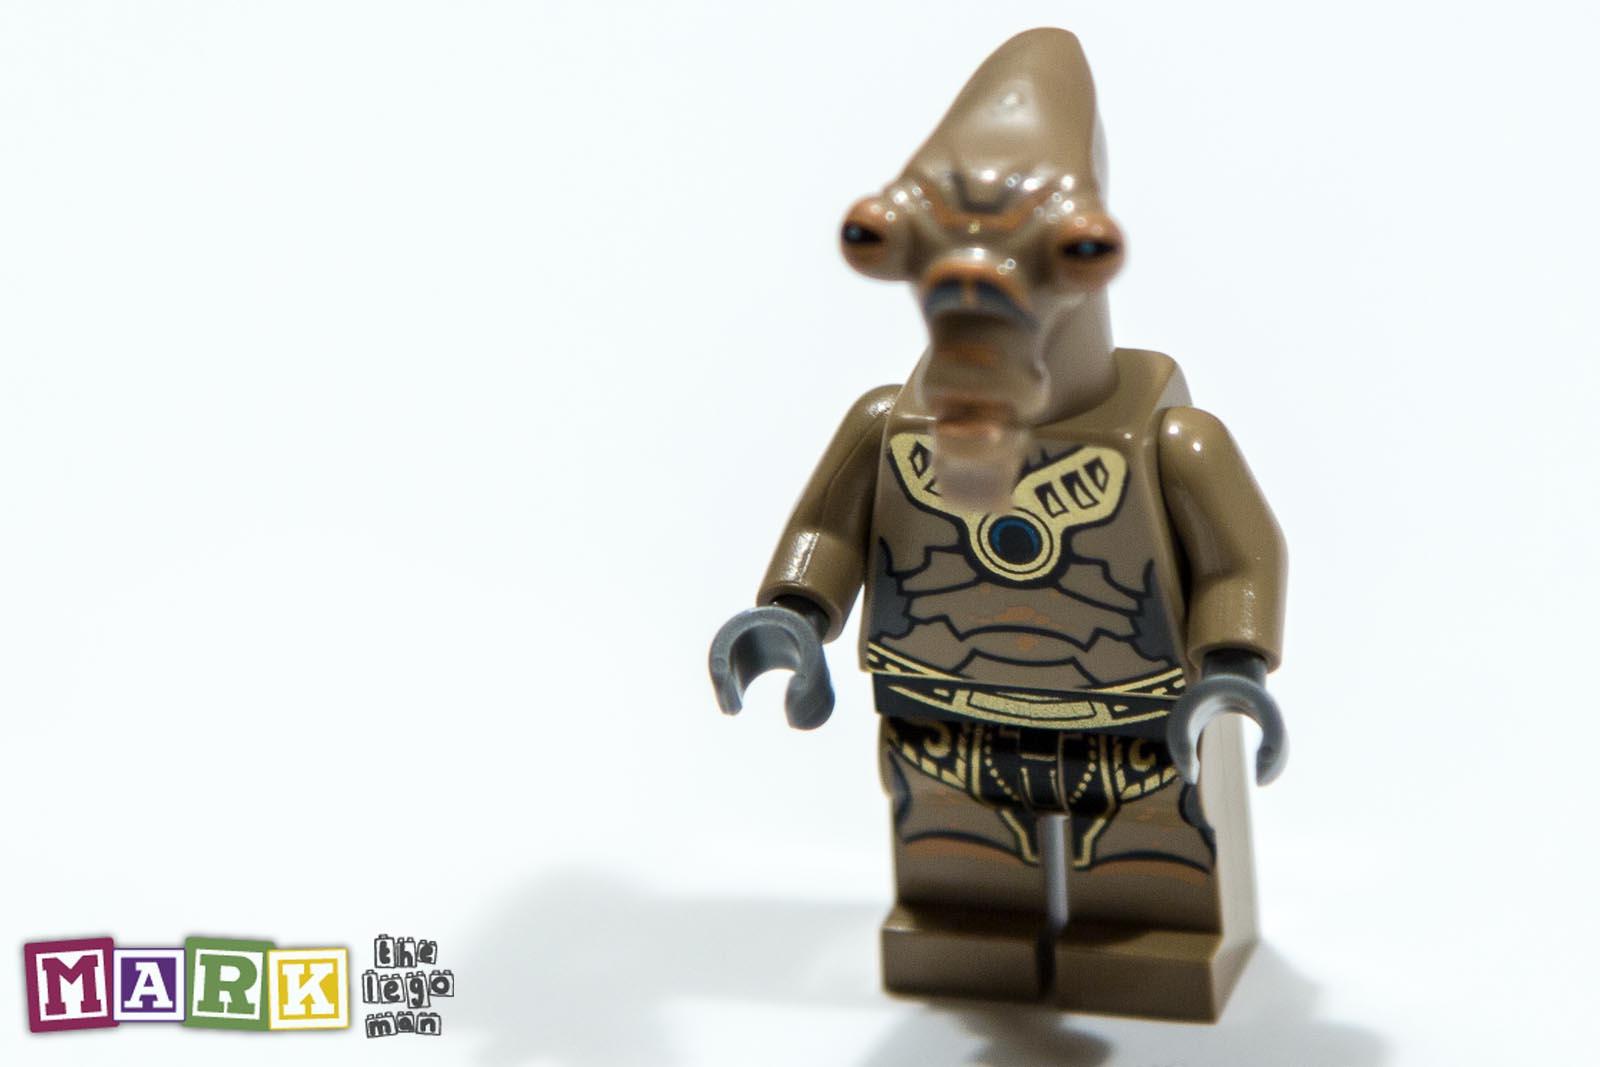 NEW Lego Star Wars minifig - Geonosian Warrior